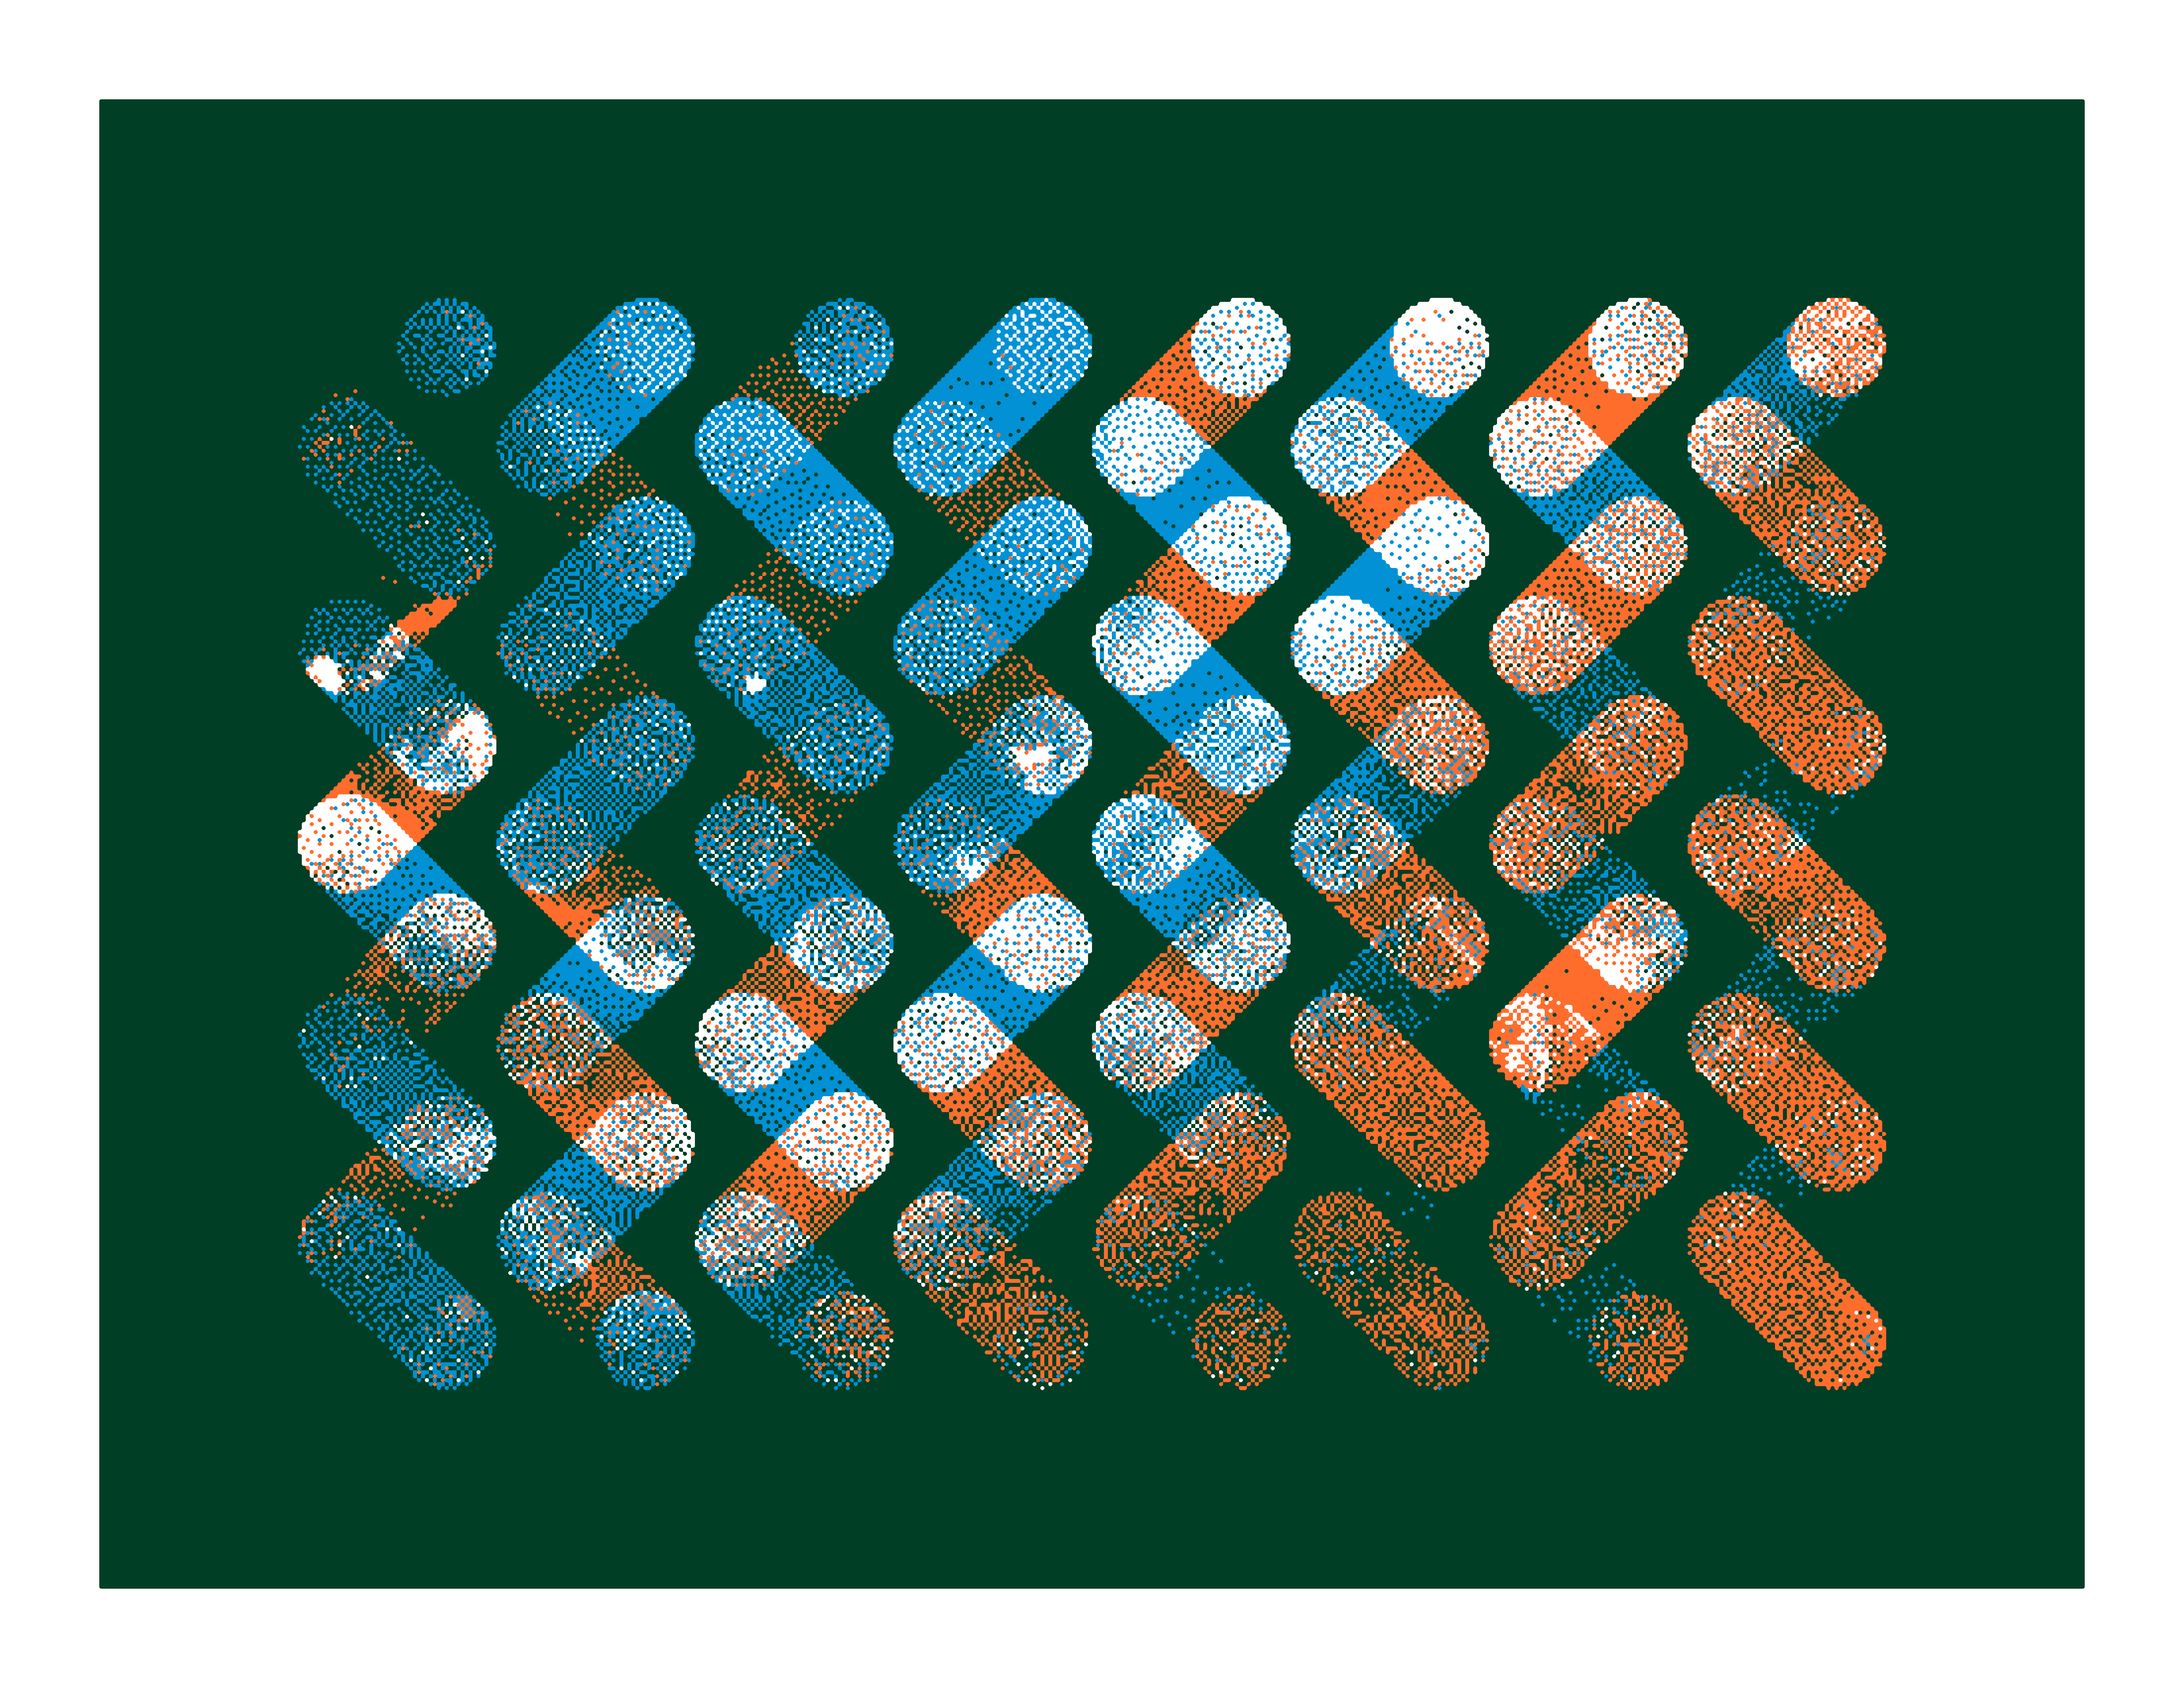 07_nebulae pattern